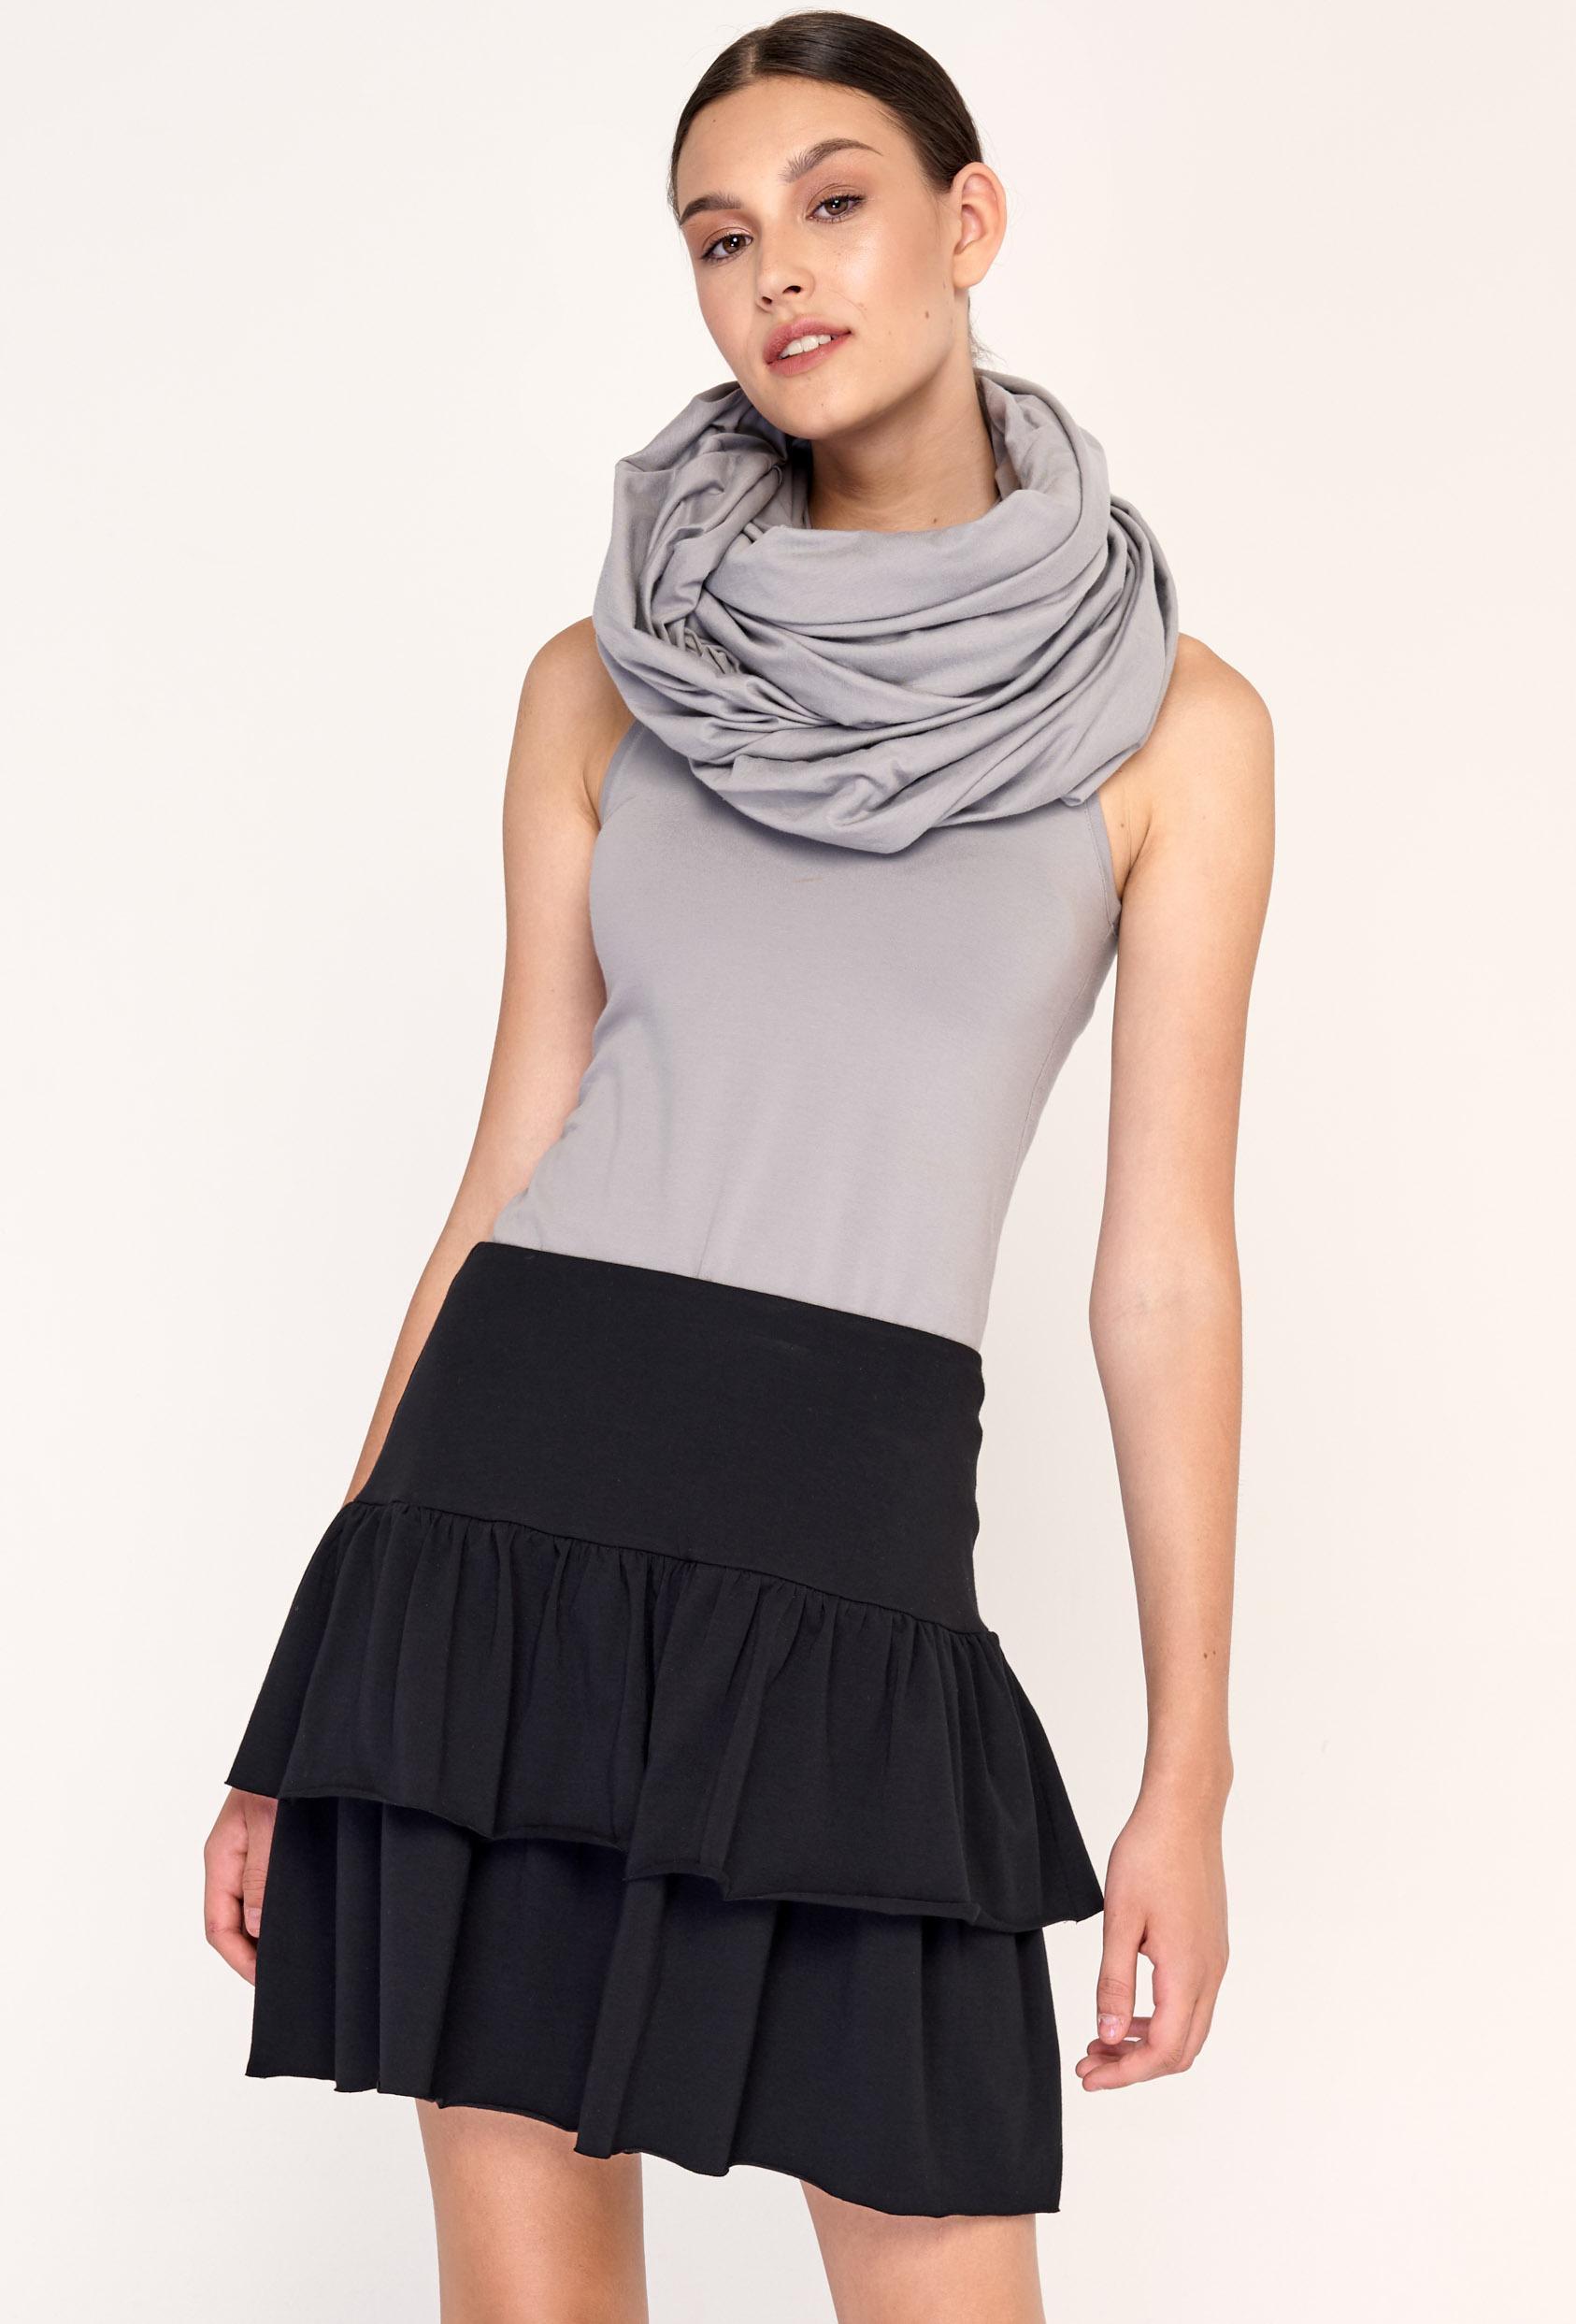 Spódnica mini rozkloszowana MARLA SKIRT czarne